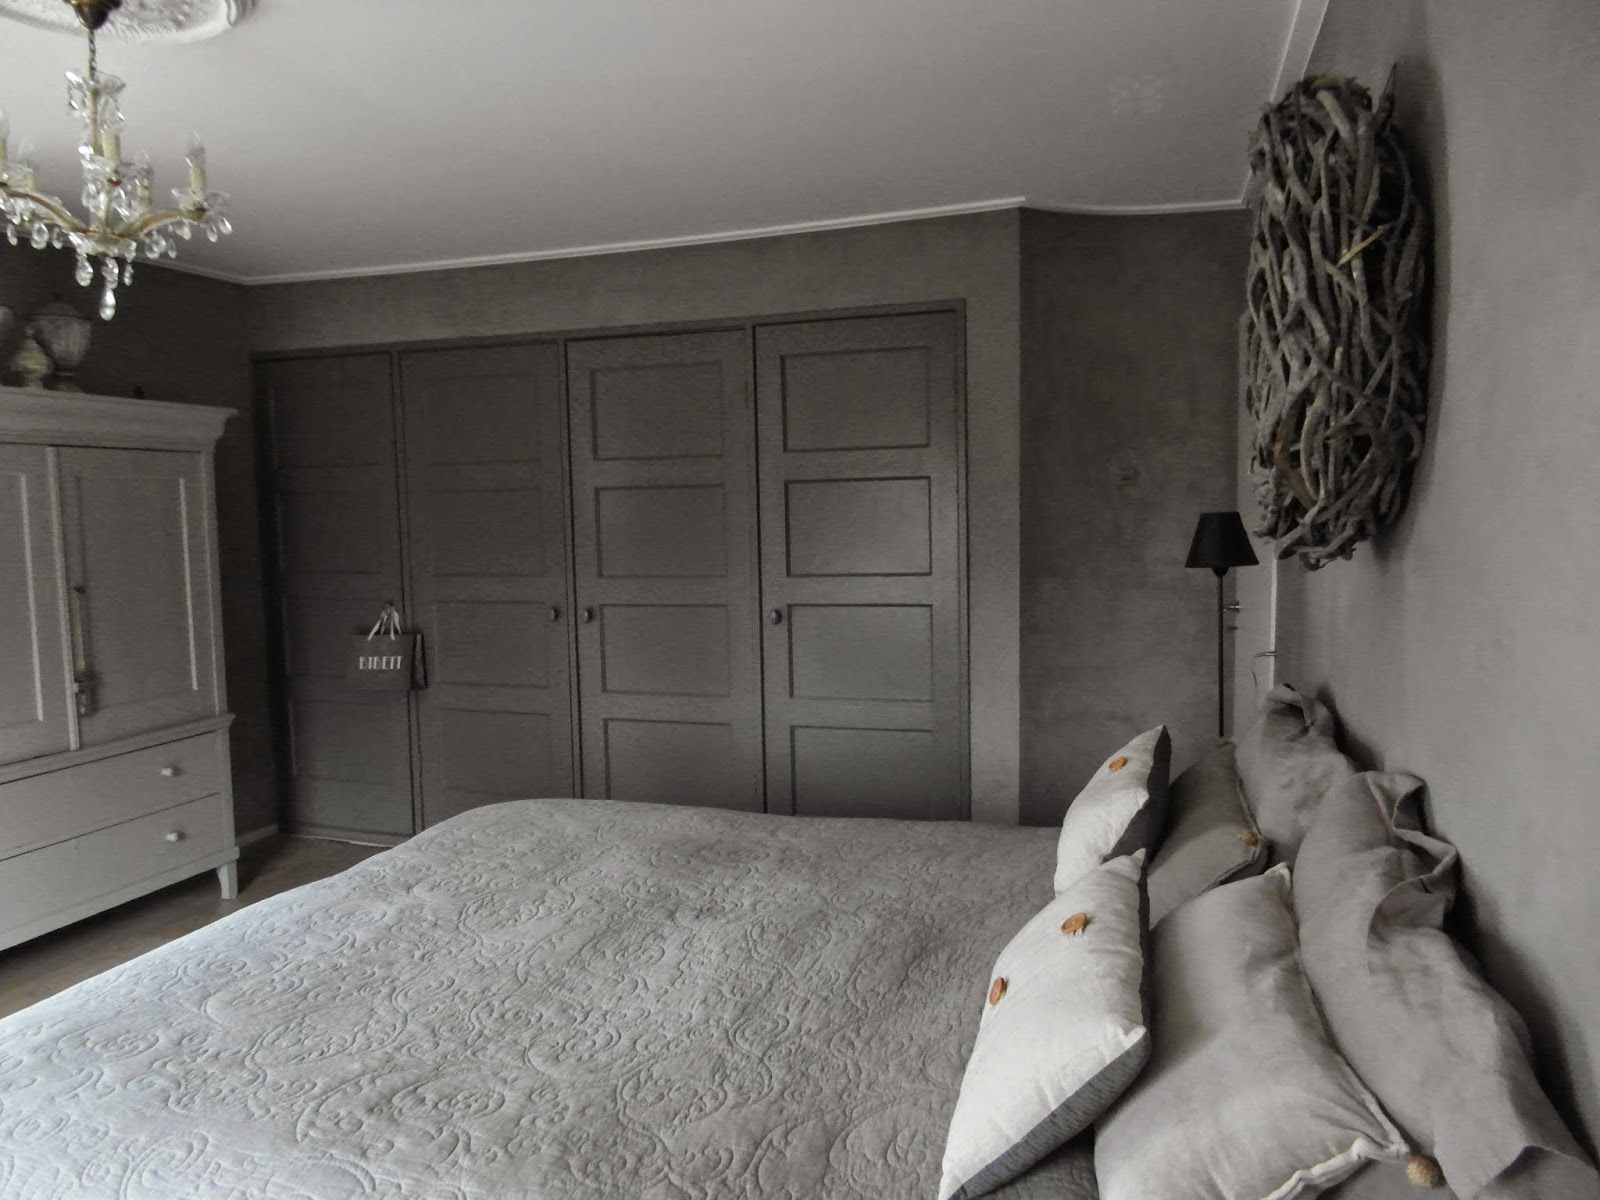 Gordijnen In Slaapkamer : Easyliving gordijnen en slaapkamer home ideas